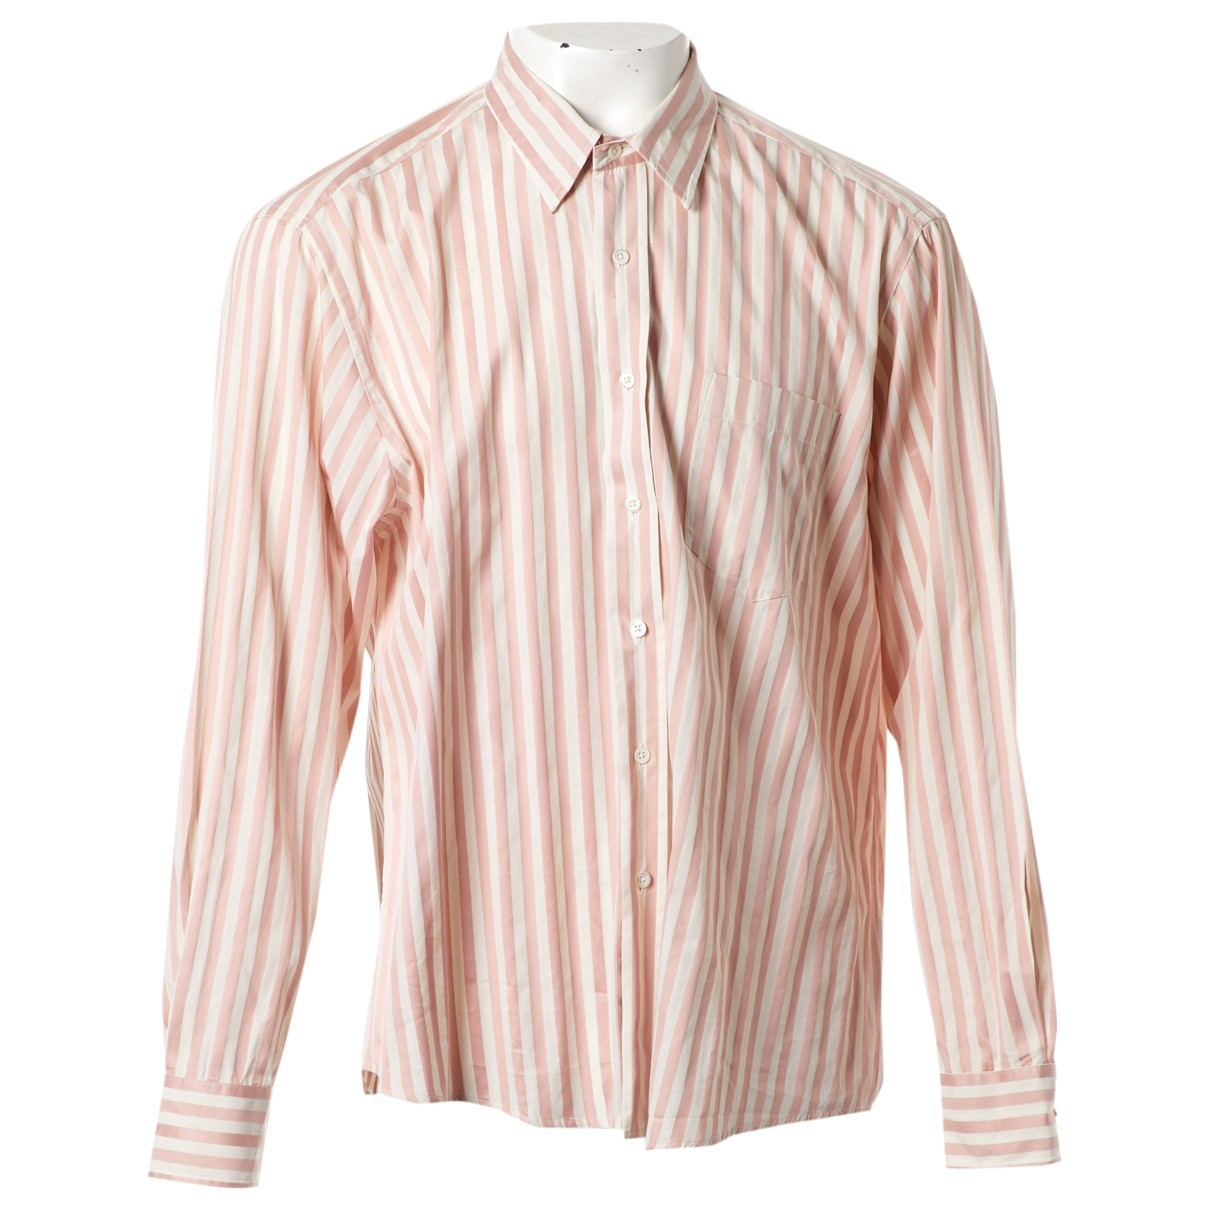 Ami \N Pink Cotton Shirts for Men XL International